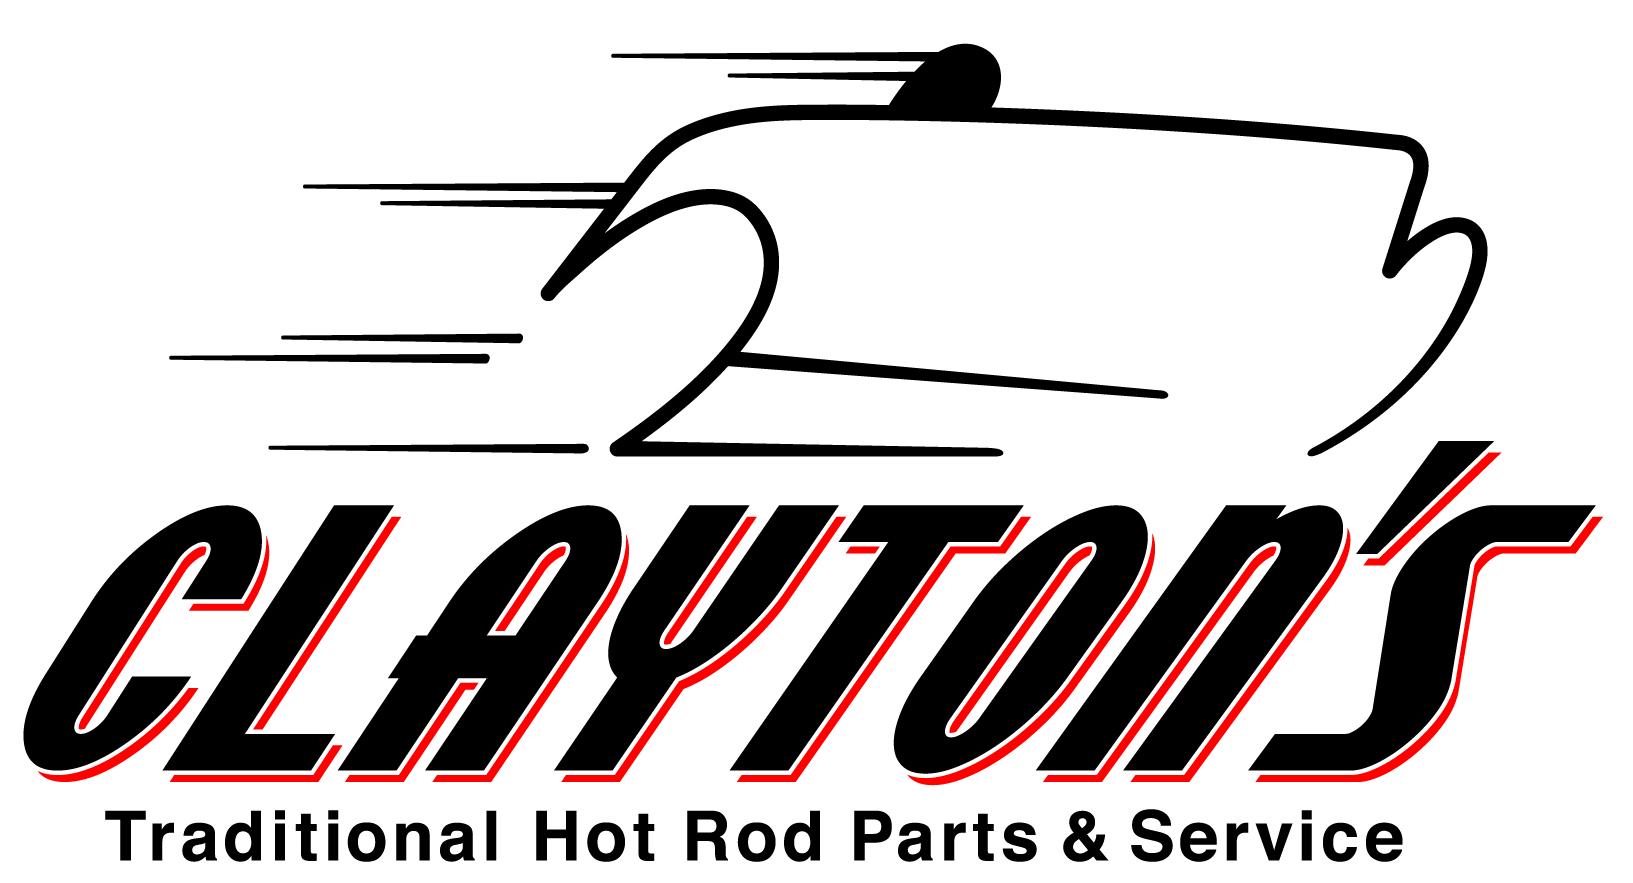 Clayton's Hotrods Logo